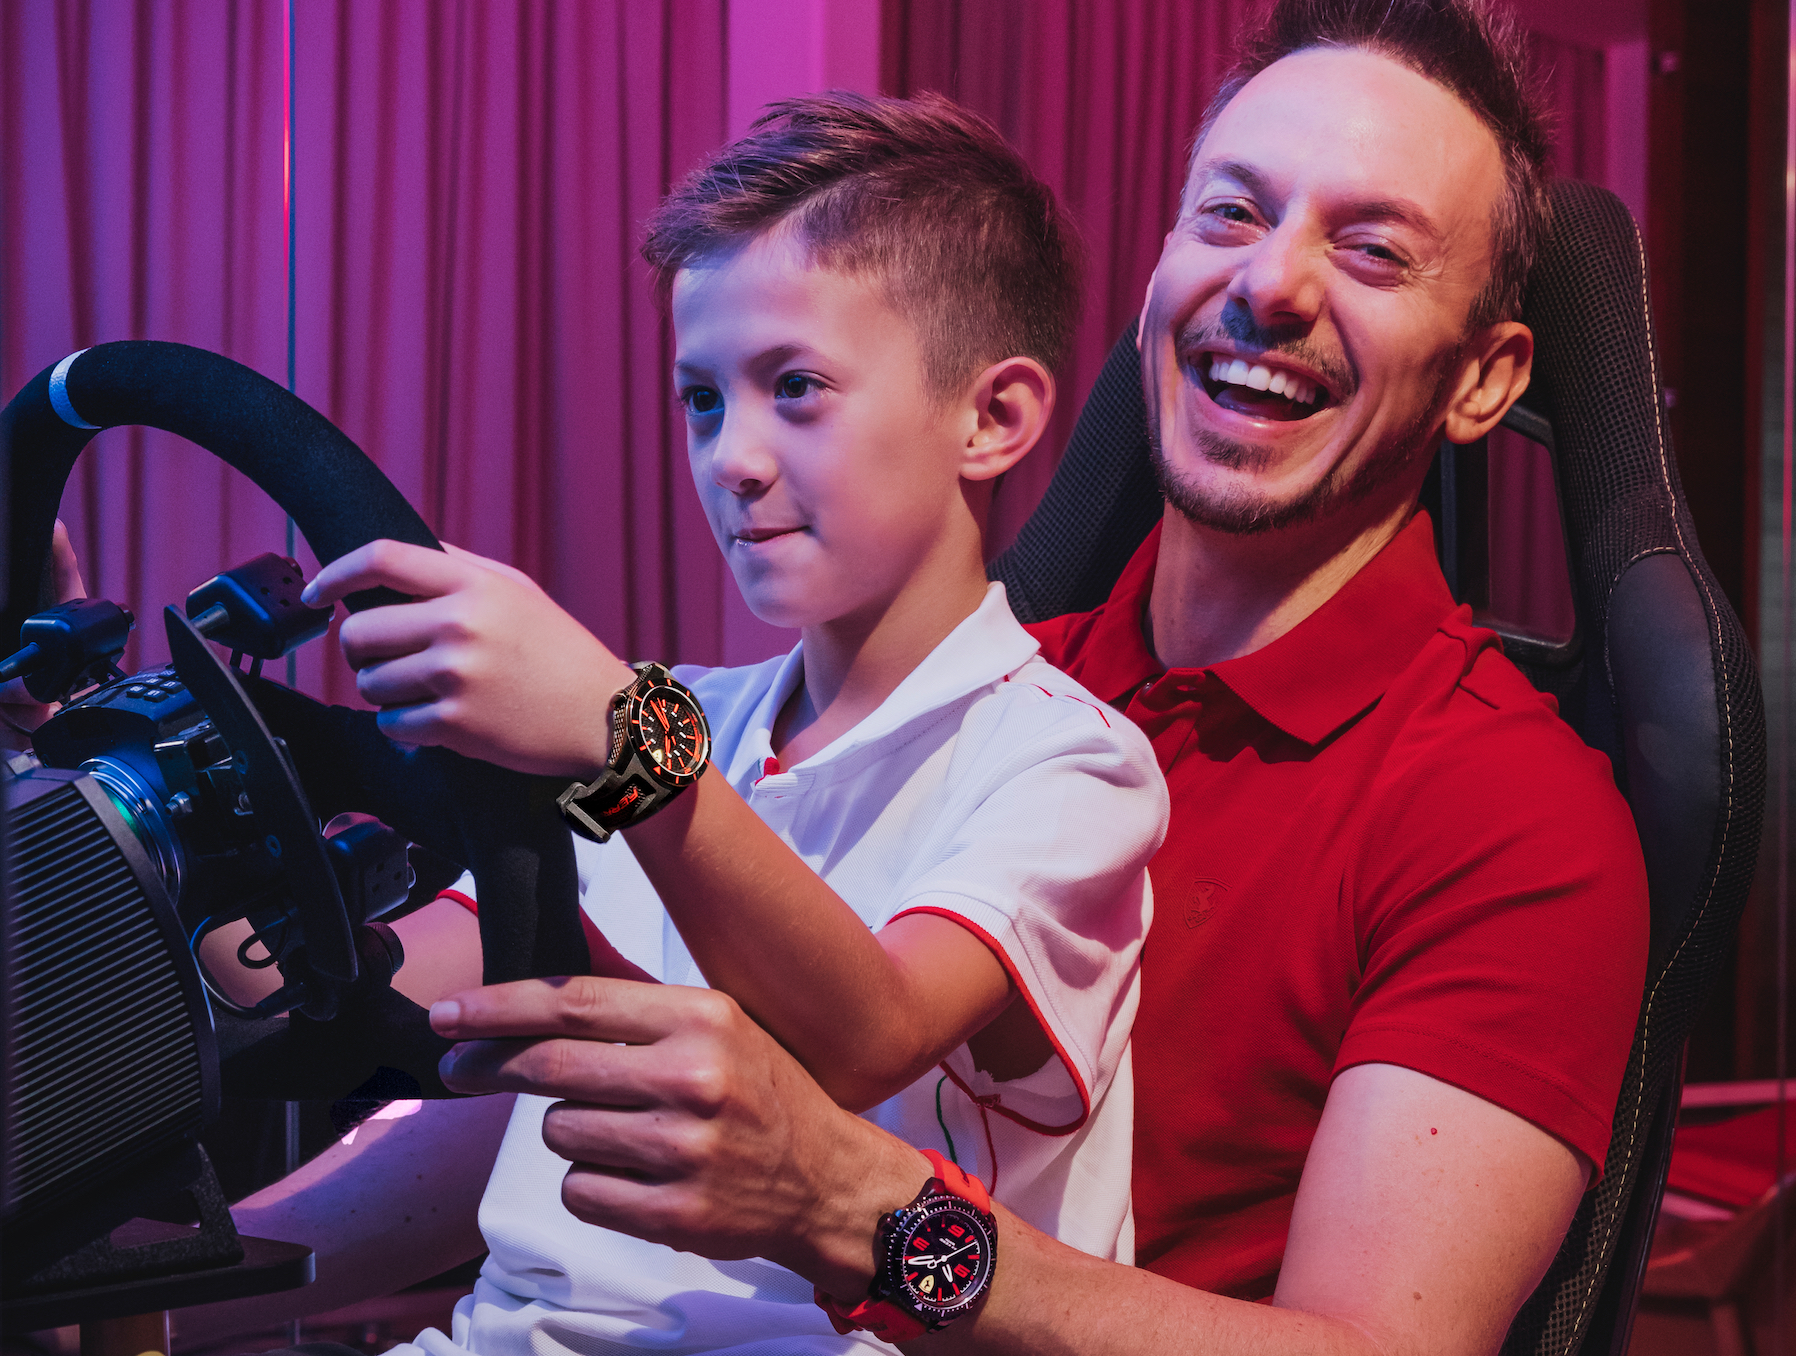 Ferrari Collector Martin Berry Talks About Fatherhood